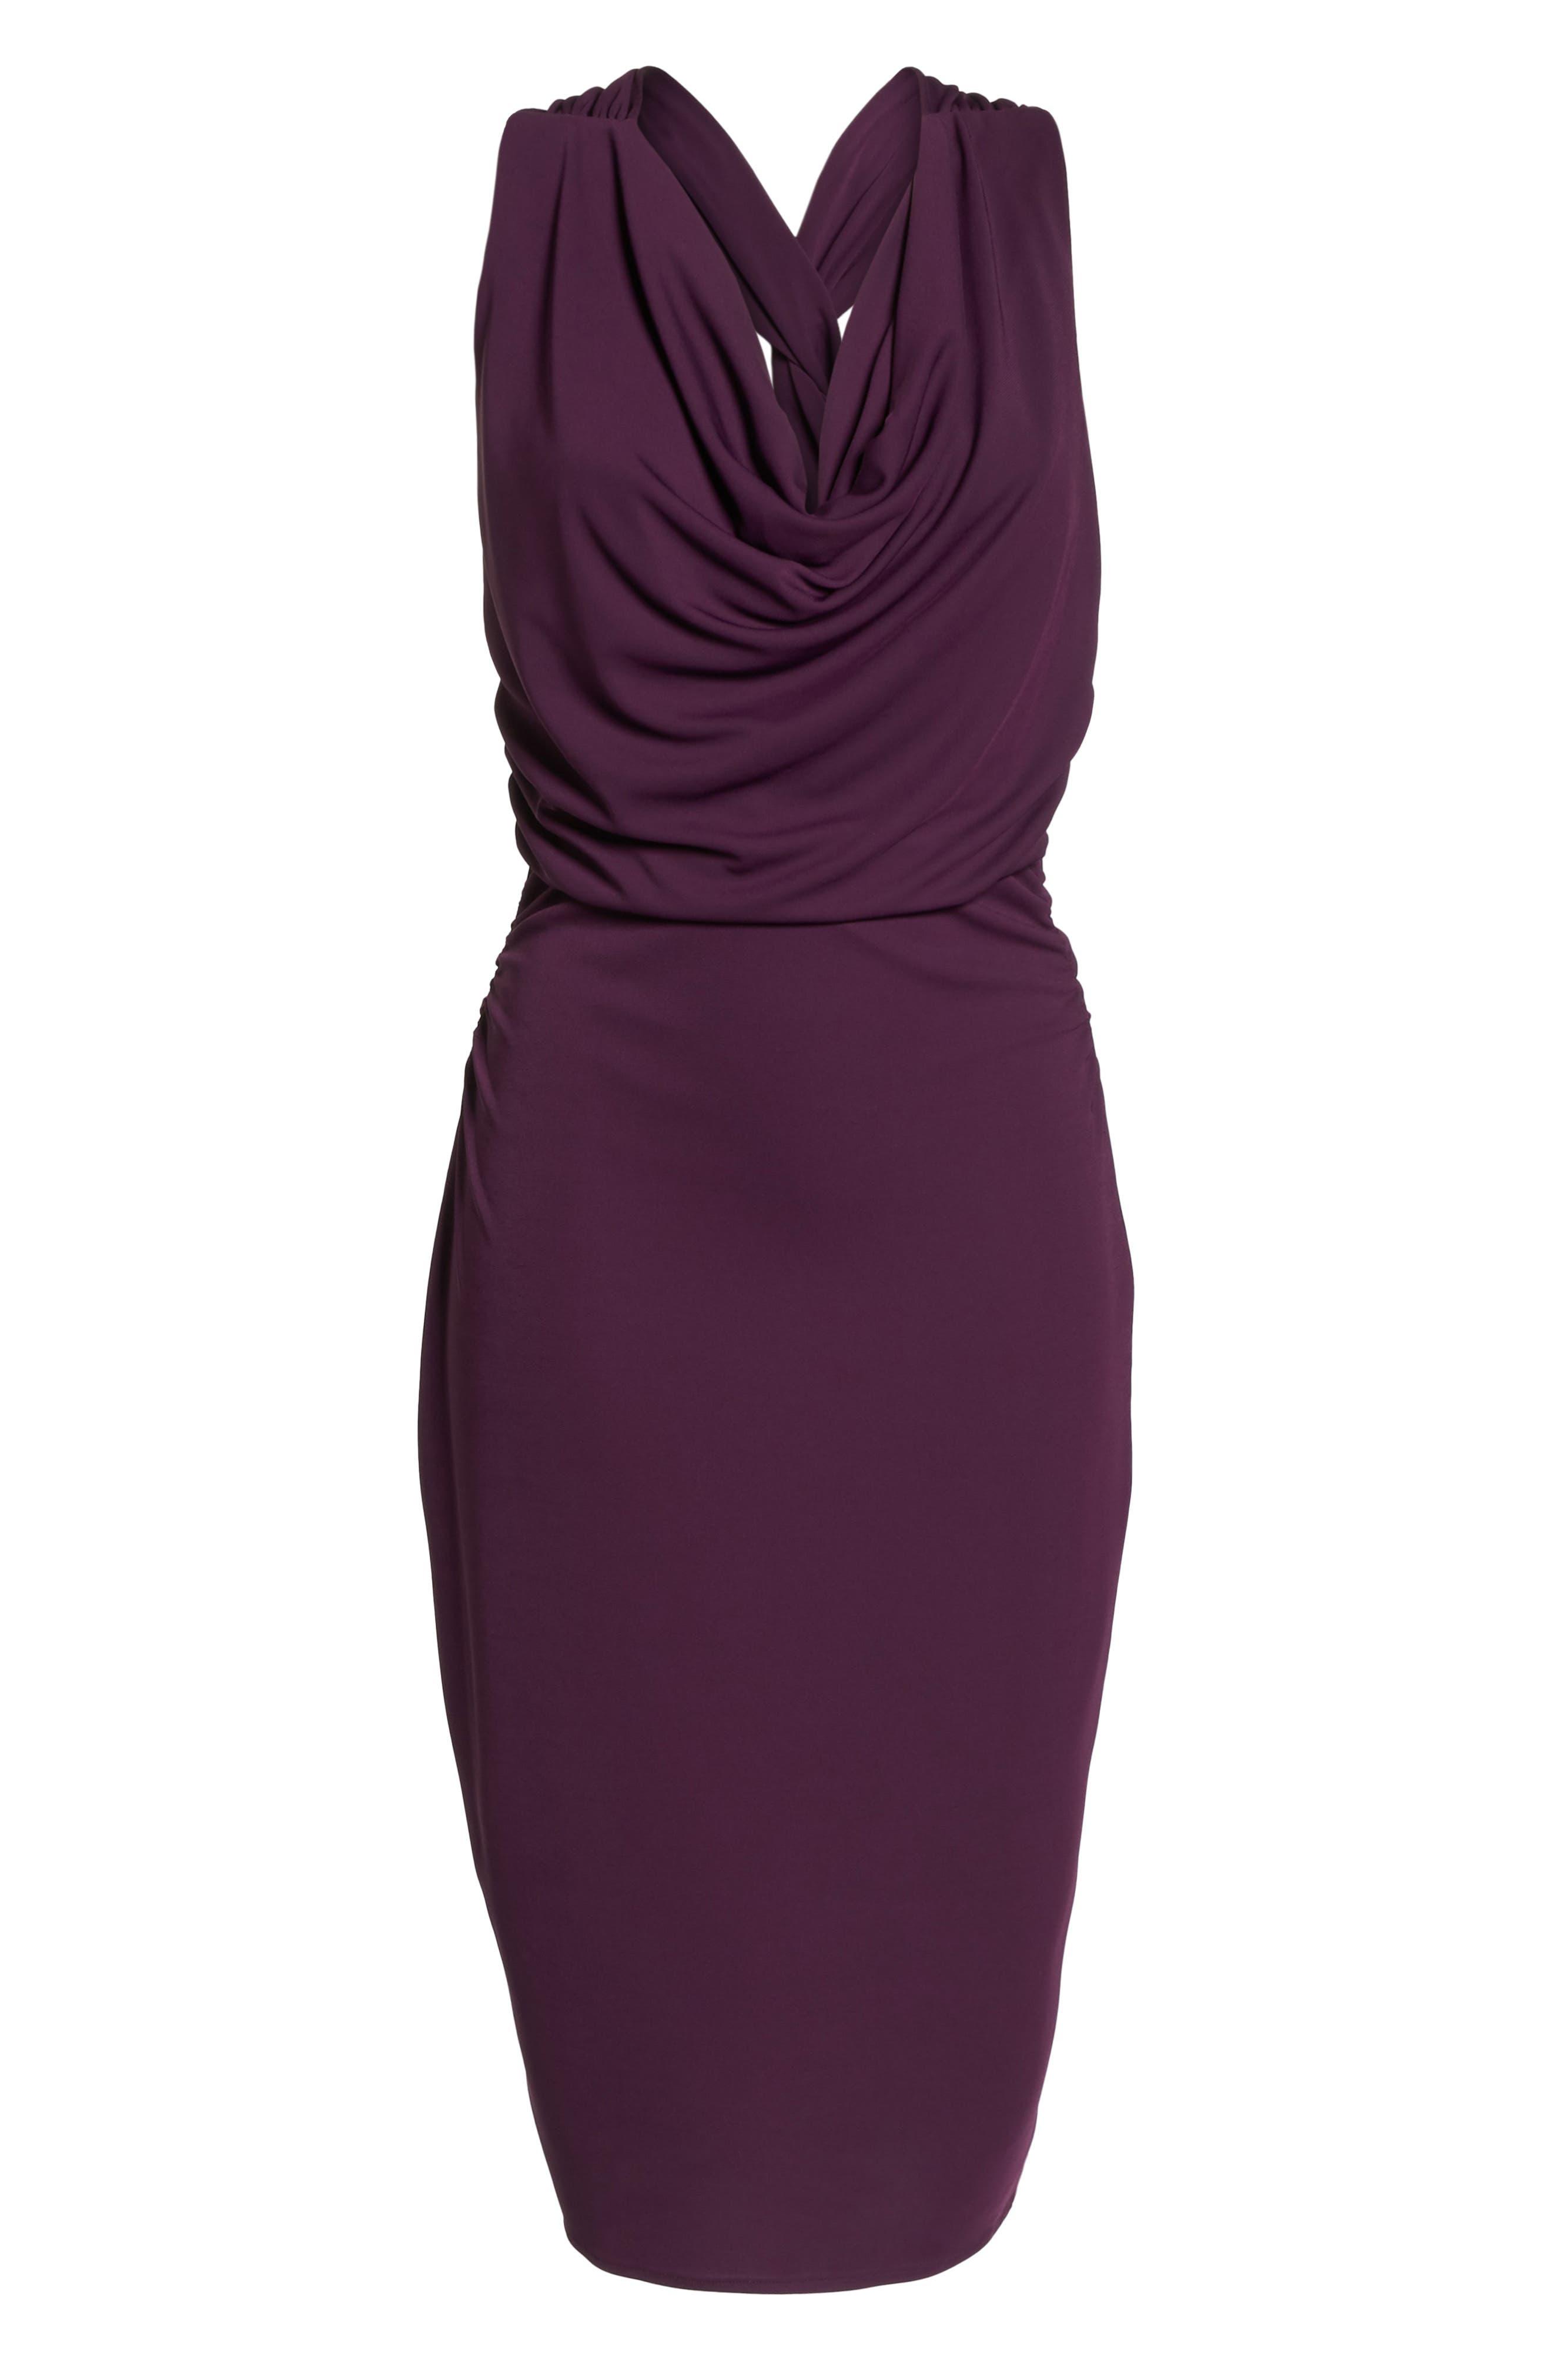 Elise Cowl Neck Sleeveless Dress,                             Alternate thumbnail 6, color,                             Wine